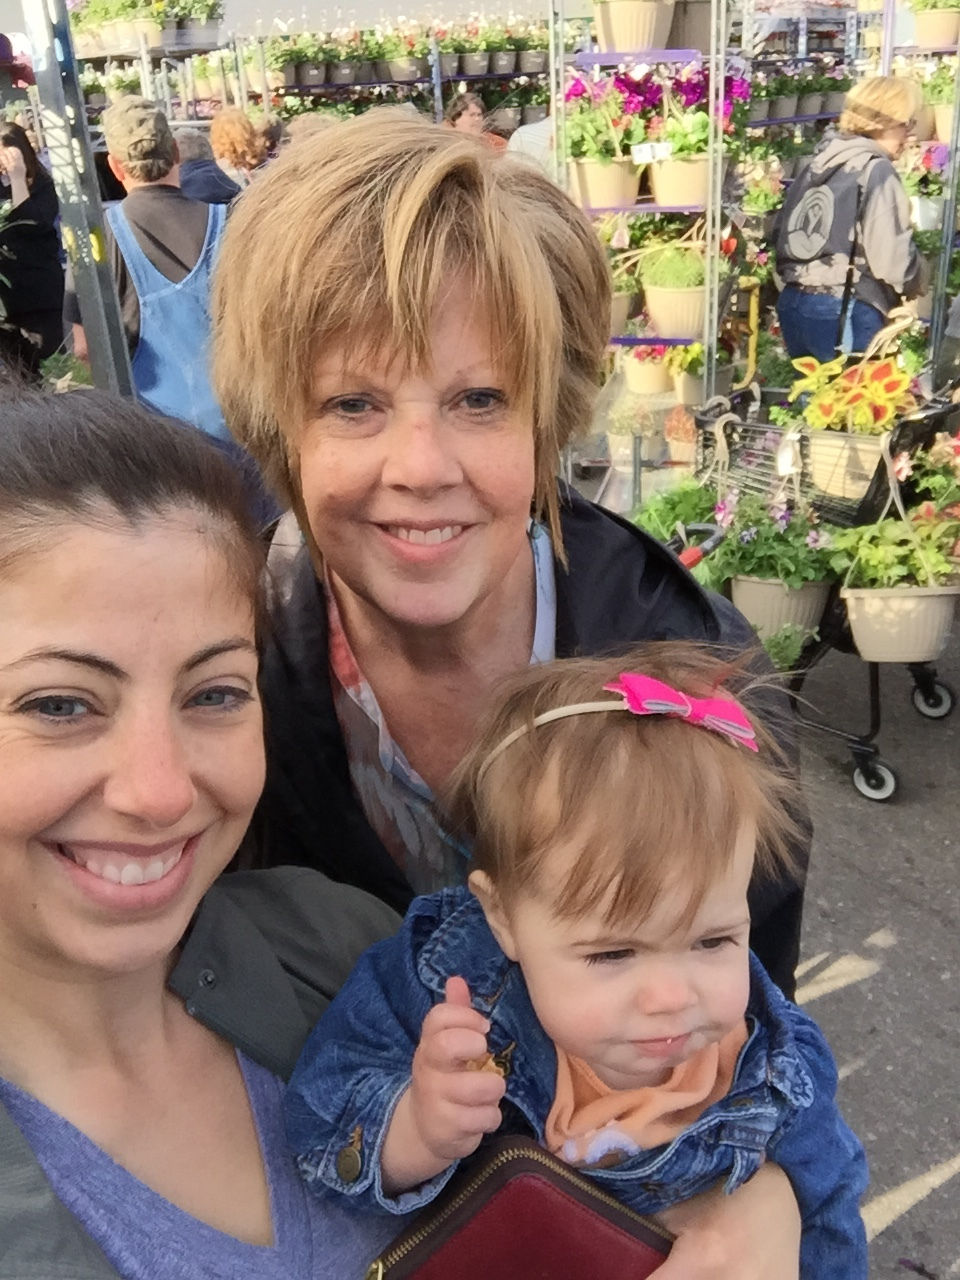 My mom, Isla & me hitting it big at a plant sale.